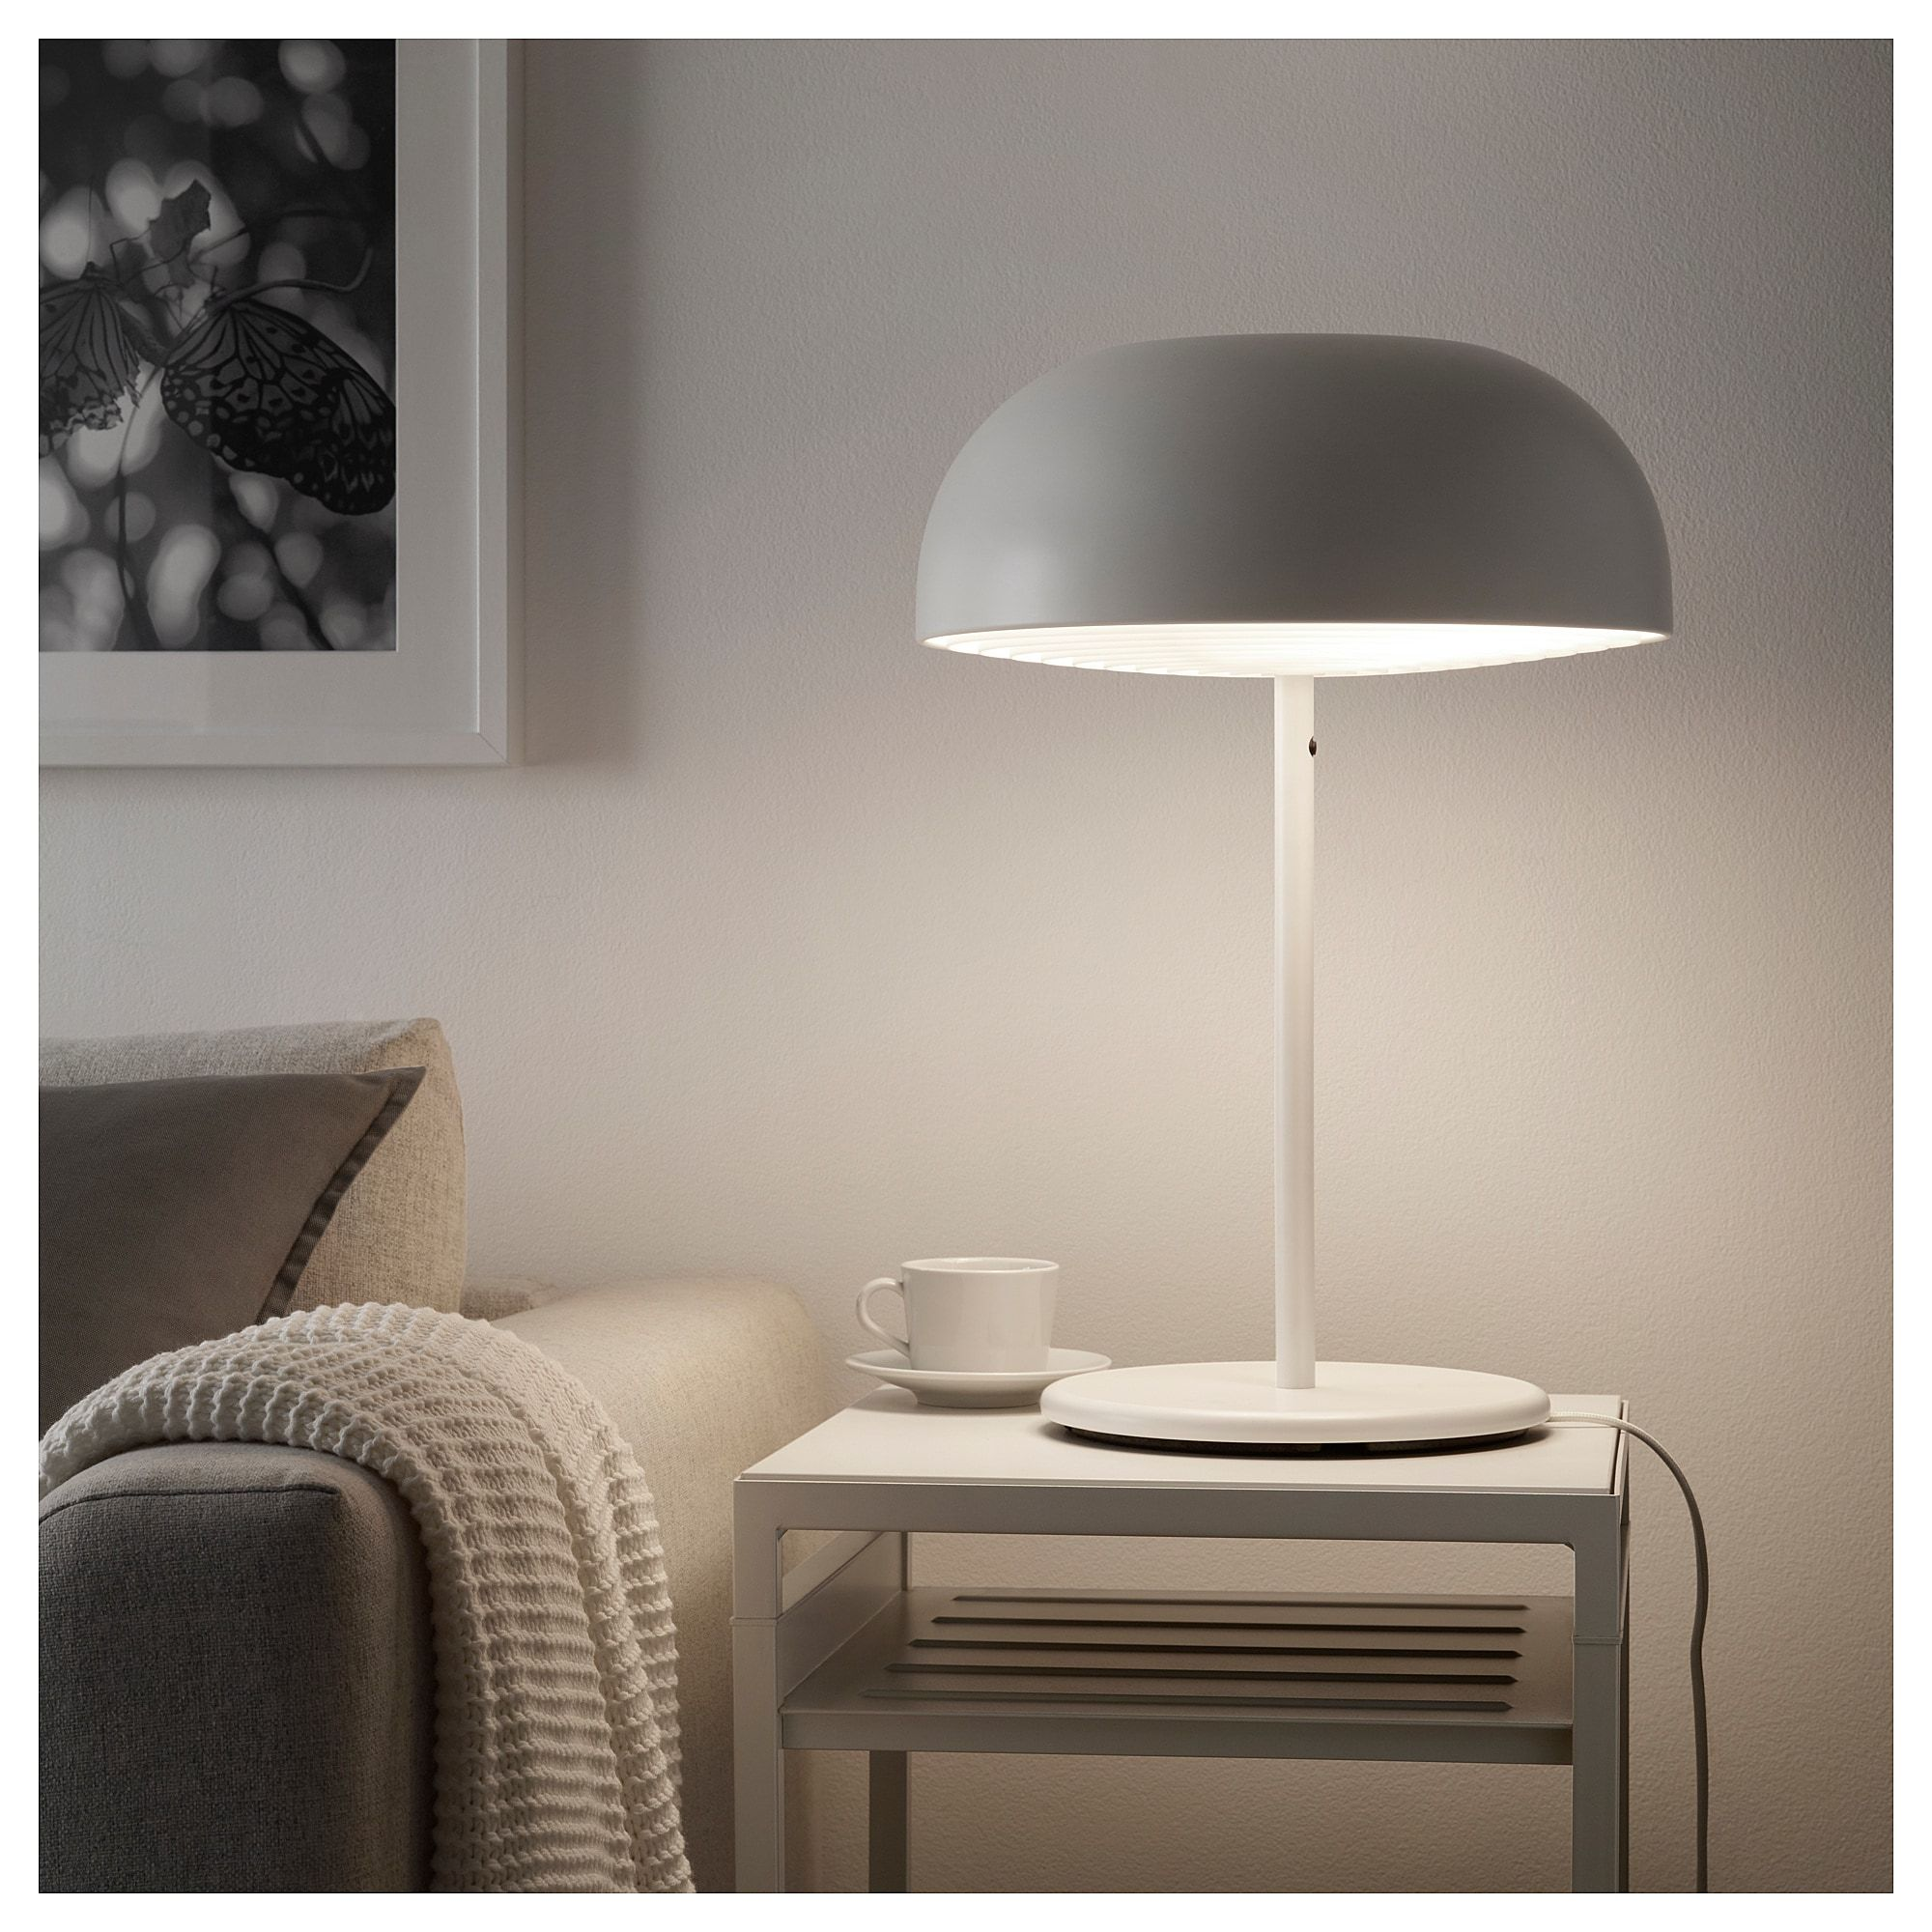 Nymane Table Lamp White Ikea Ireland Table Lamp White Table Lamp Lamp